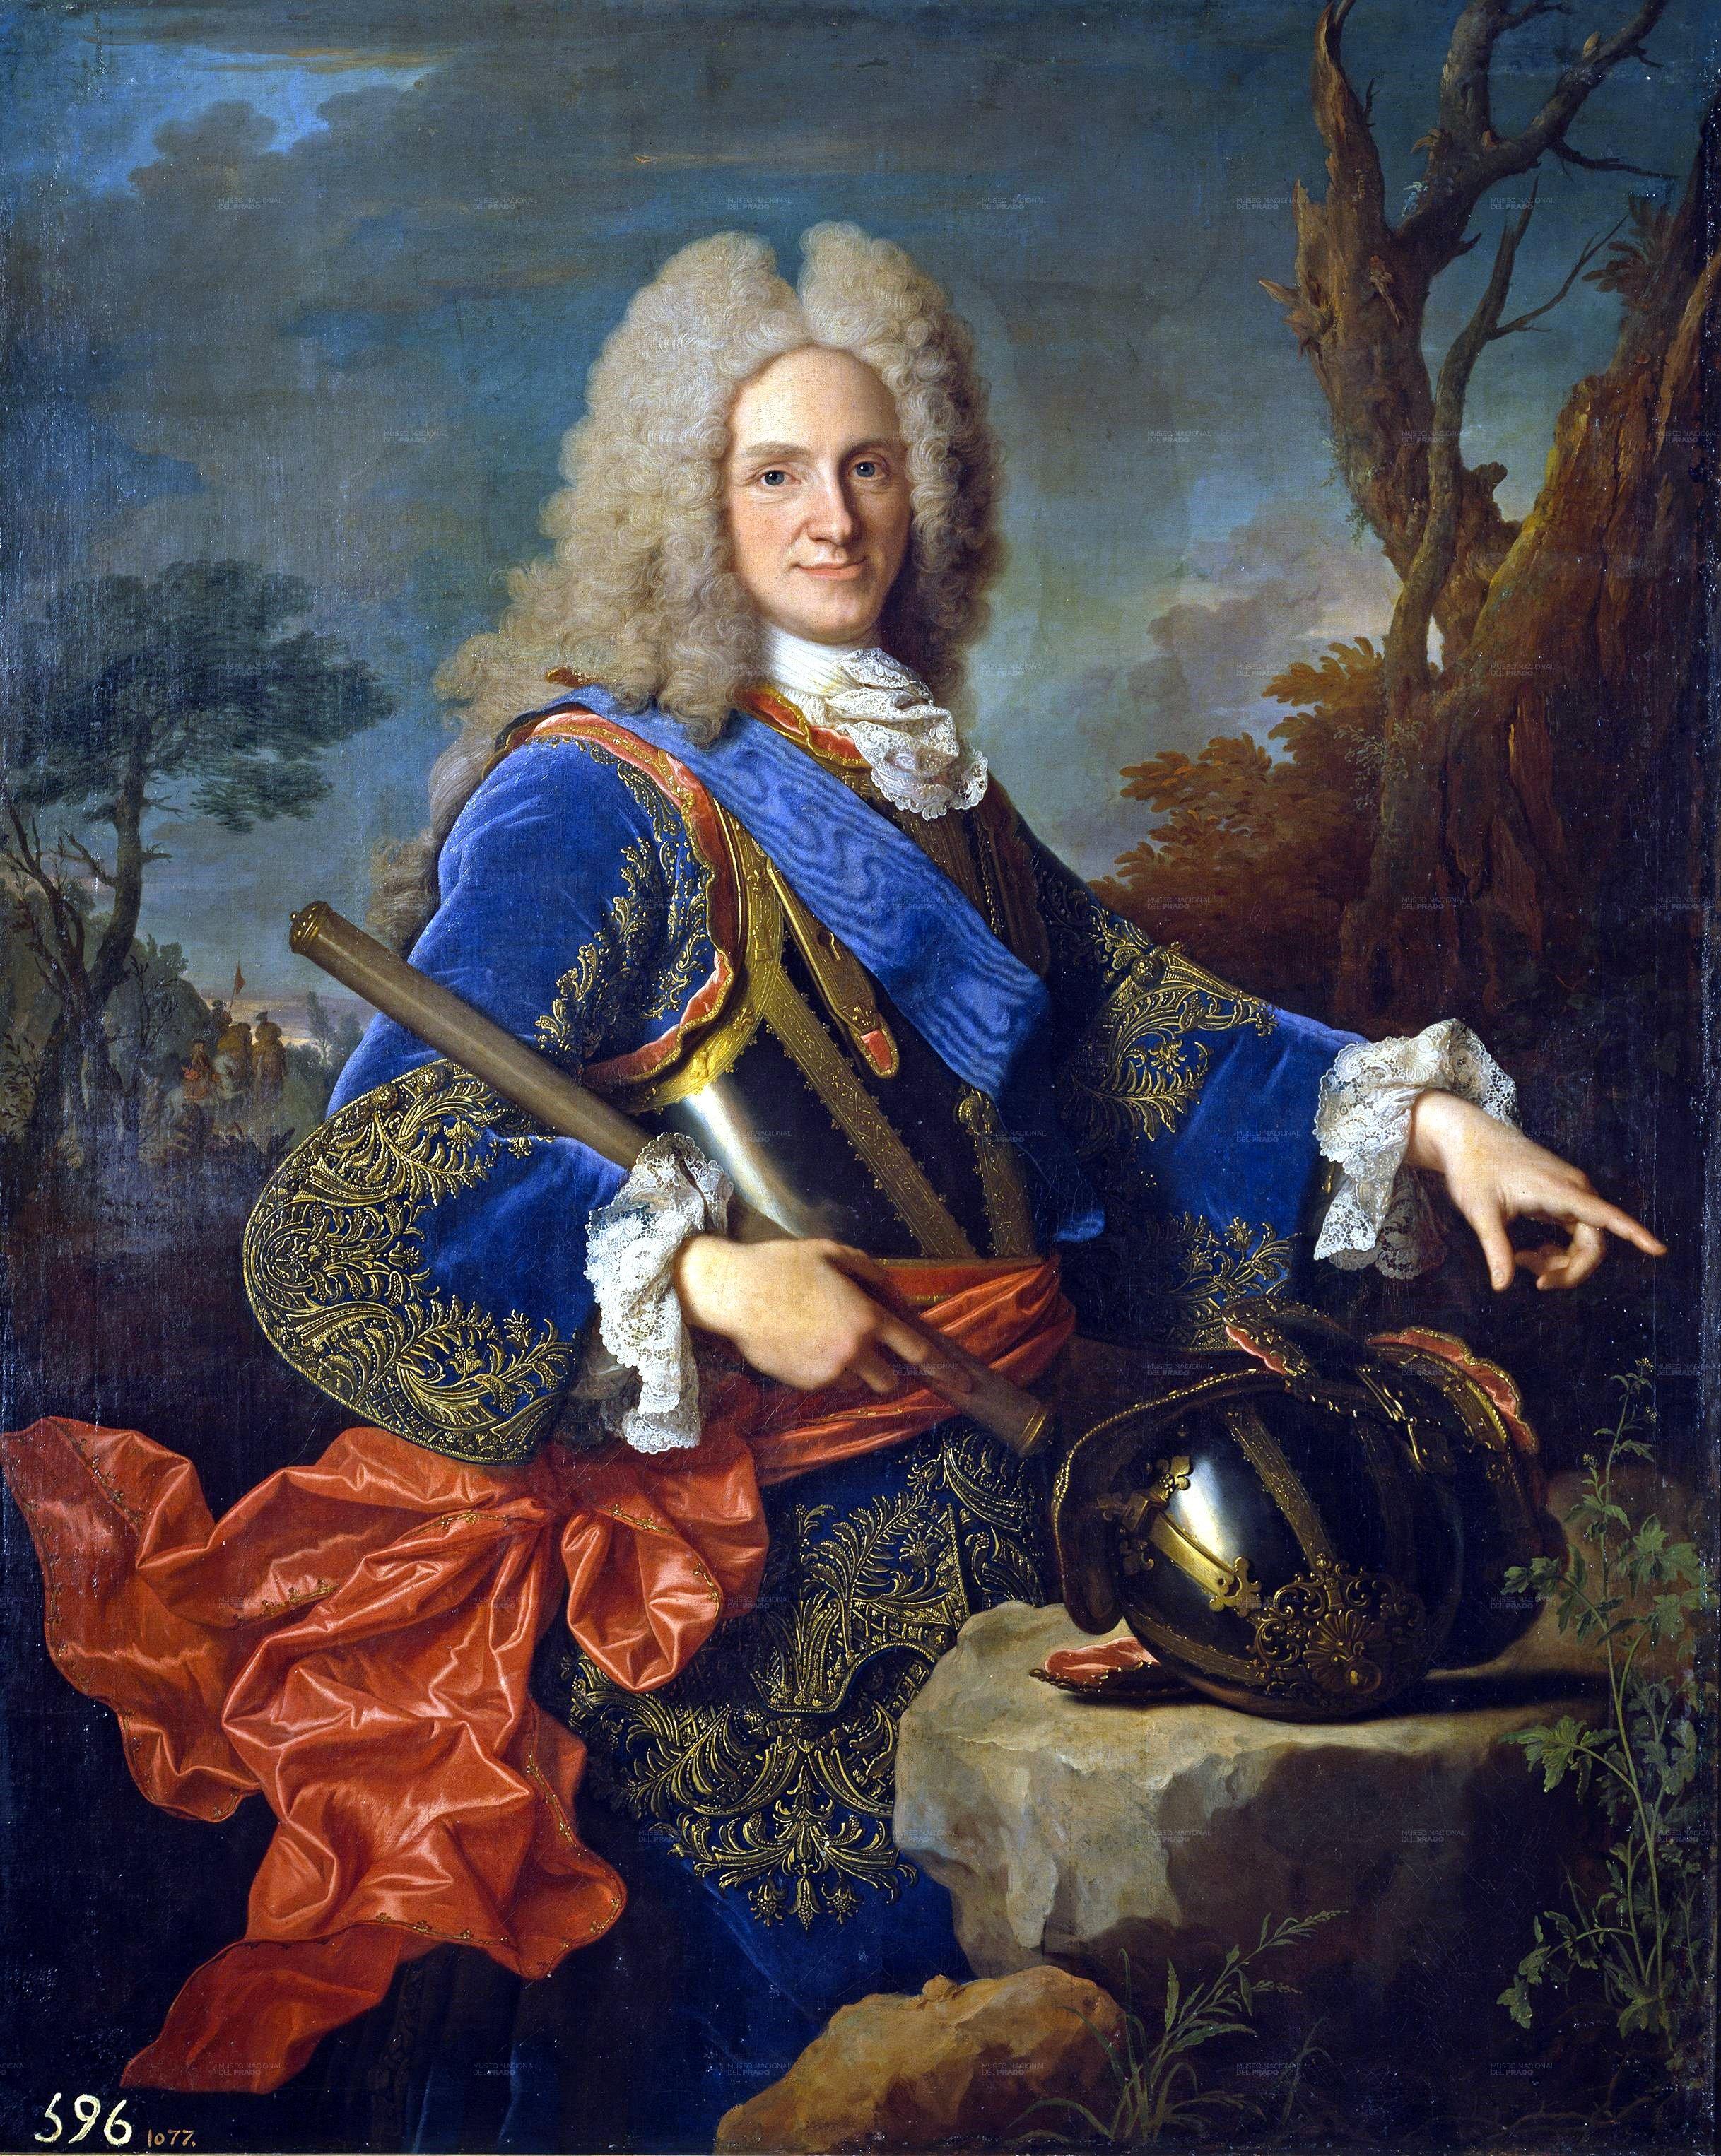 Felipe V de España - Wikipedia, la enciclopedia libre